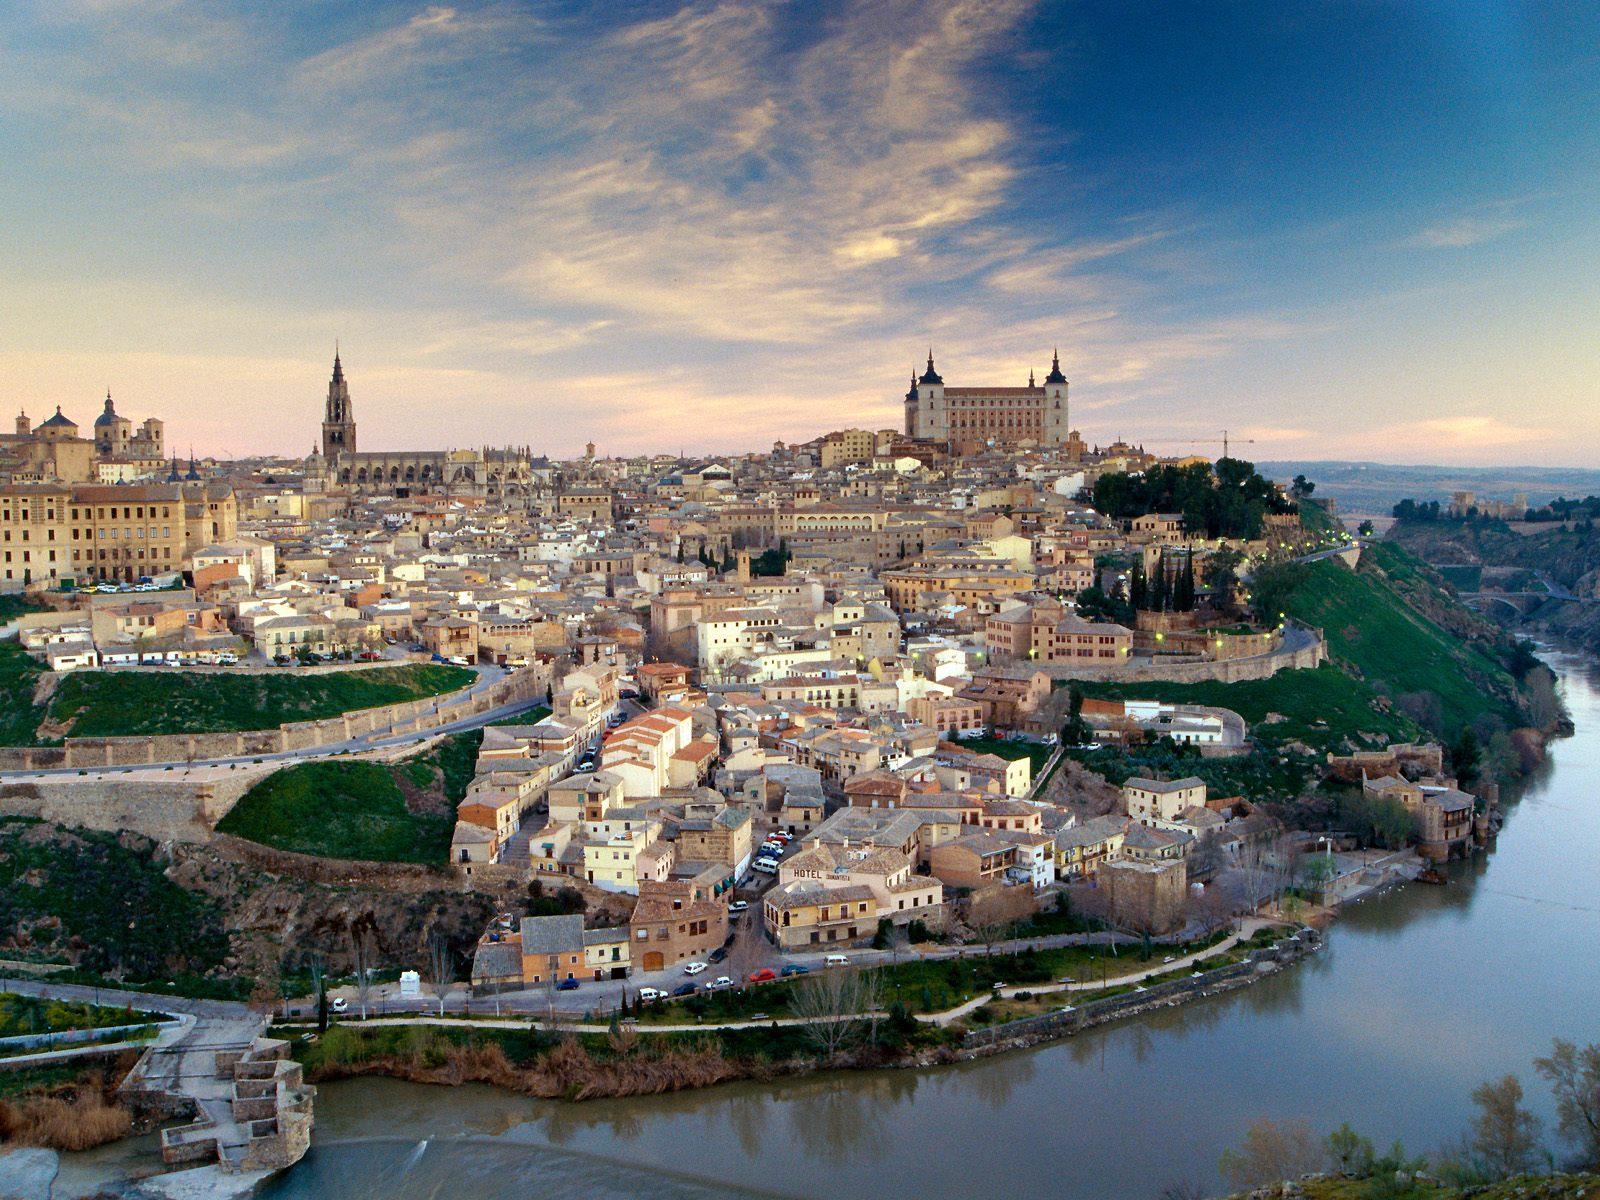 Free Download 30 Best Spain Wallpapers Full Hd Free